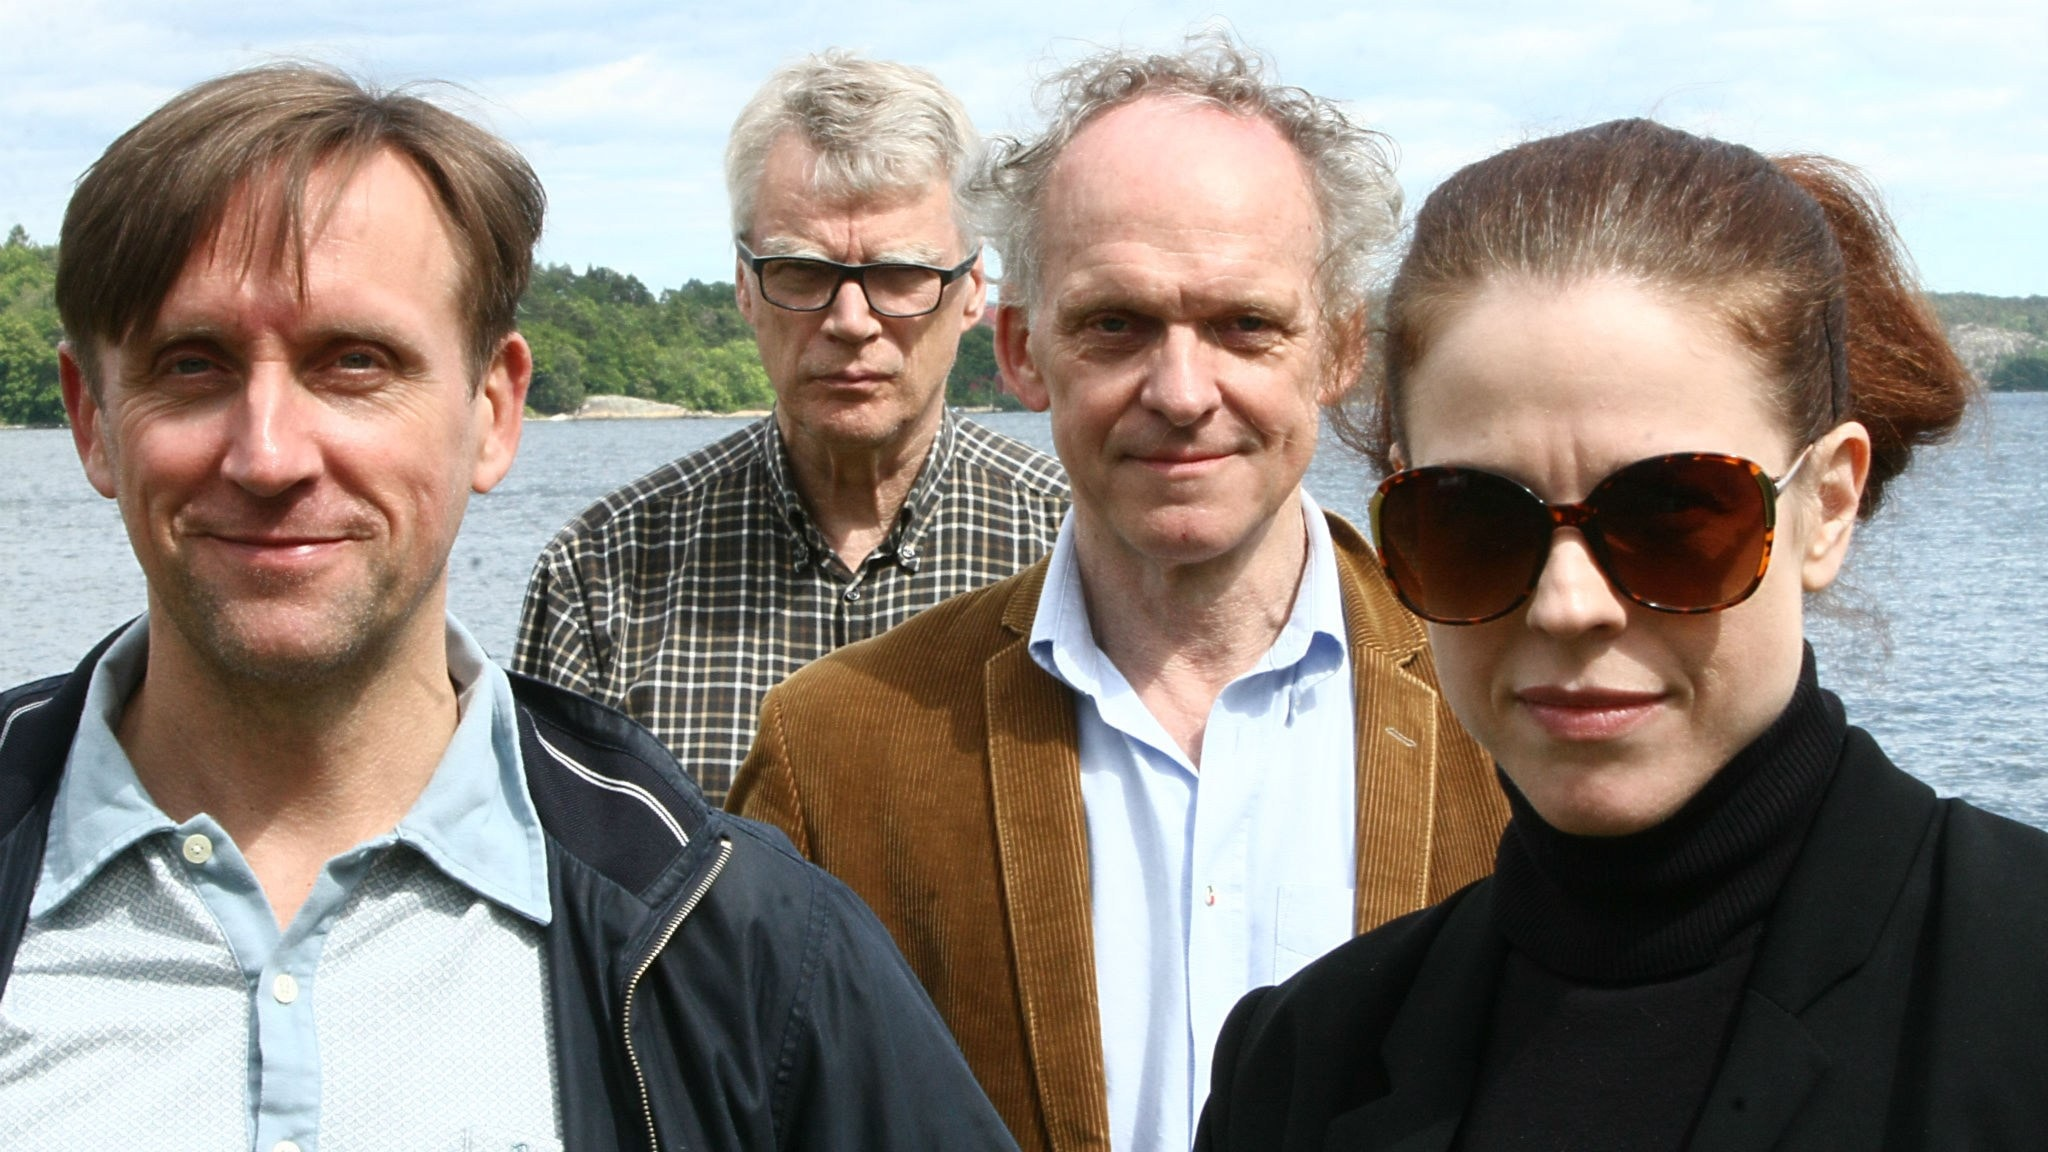 Göran Everdahl, Jonas Hallberg, Ingvar Storm och Jessika Gedin. Foto: Benjamin Thorén.